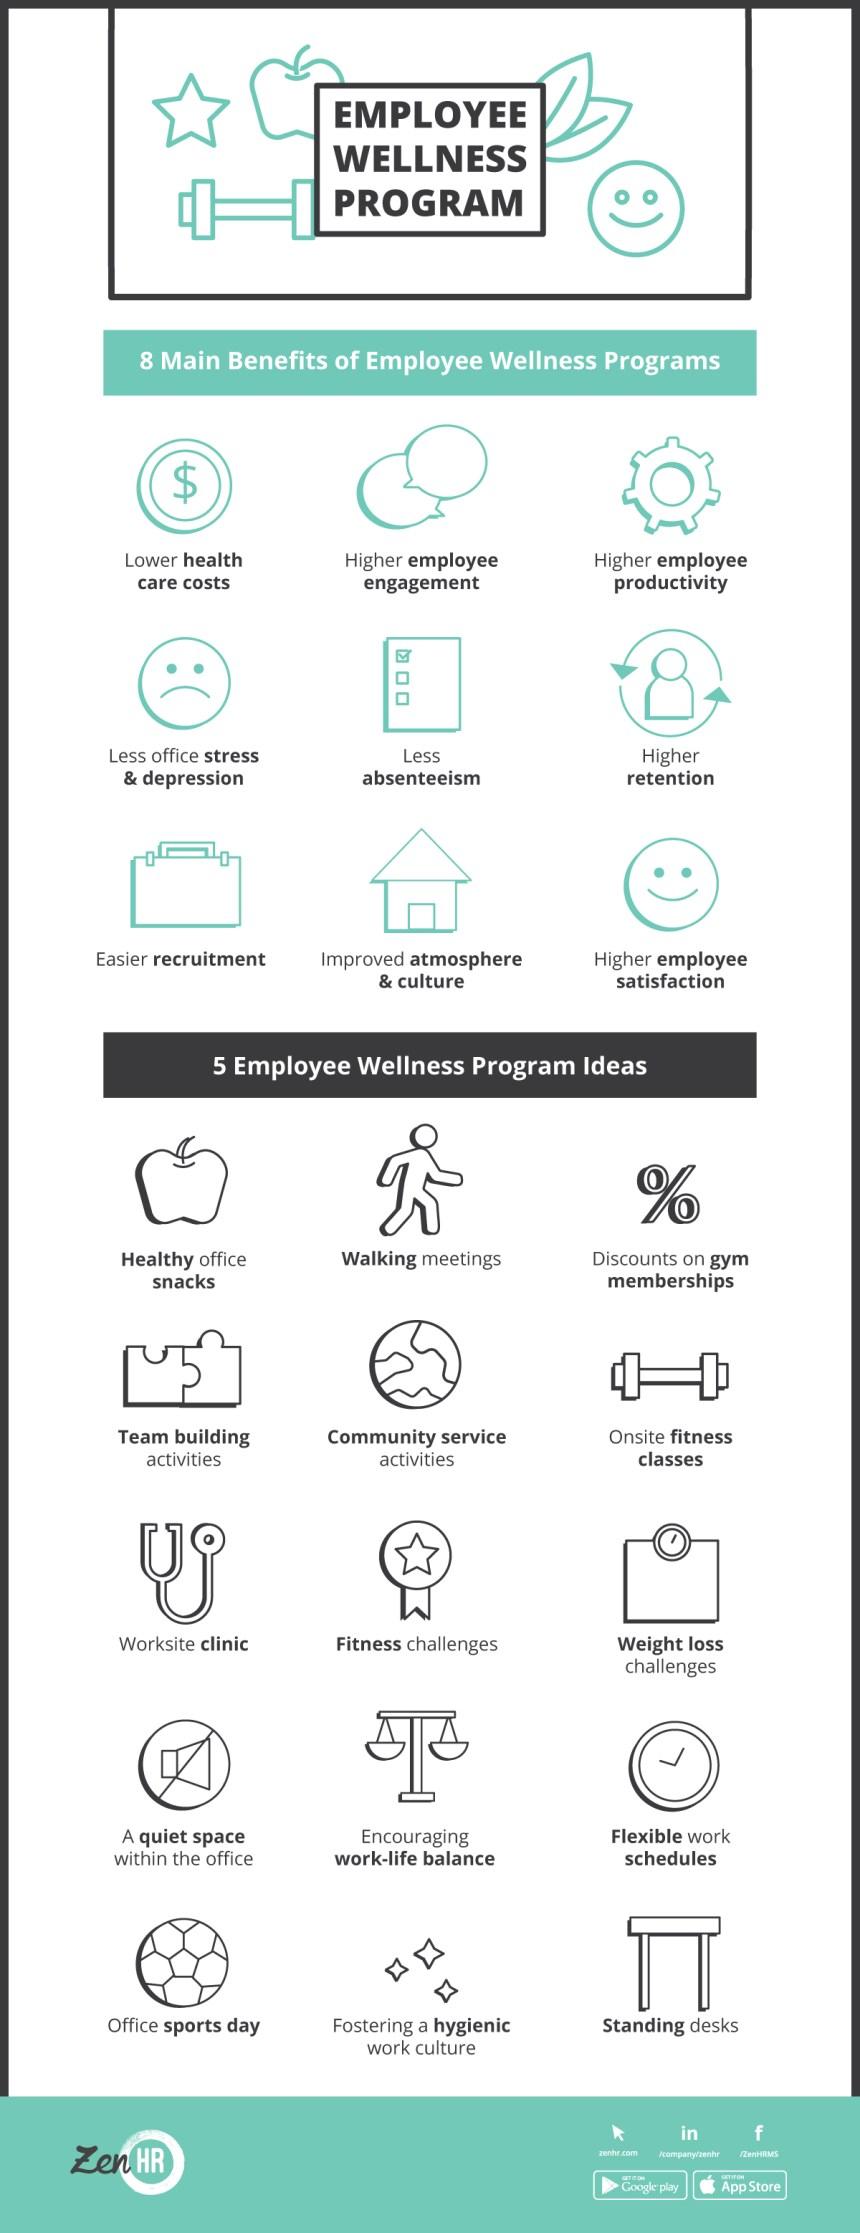 ZenHR-EmployeeWellnessProgram-infographic